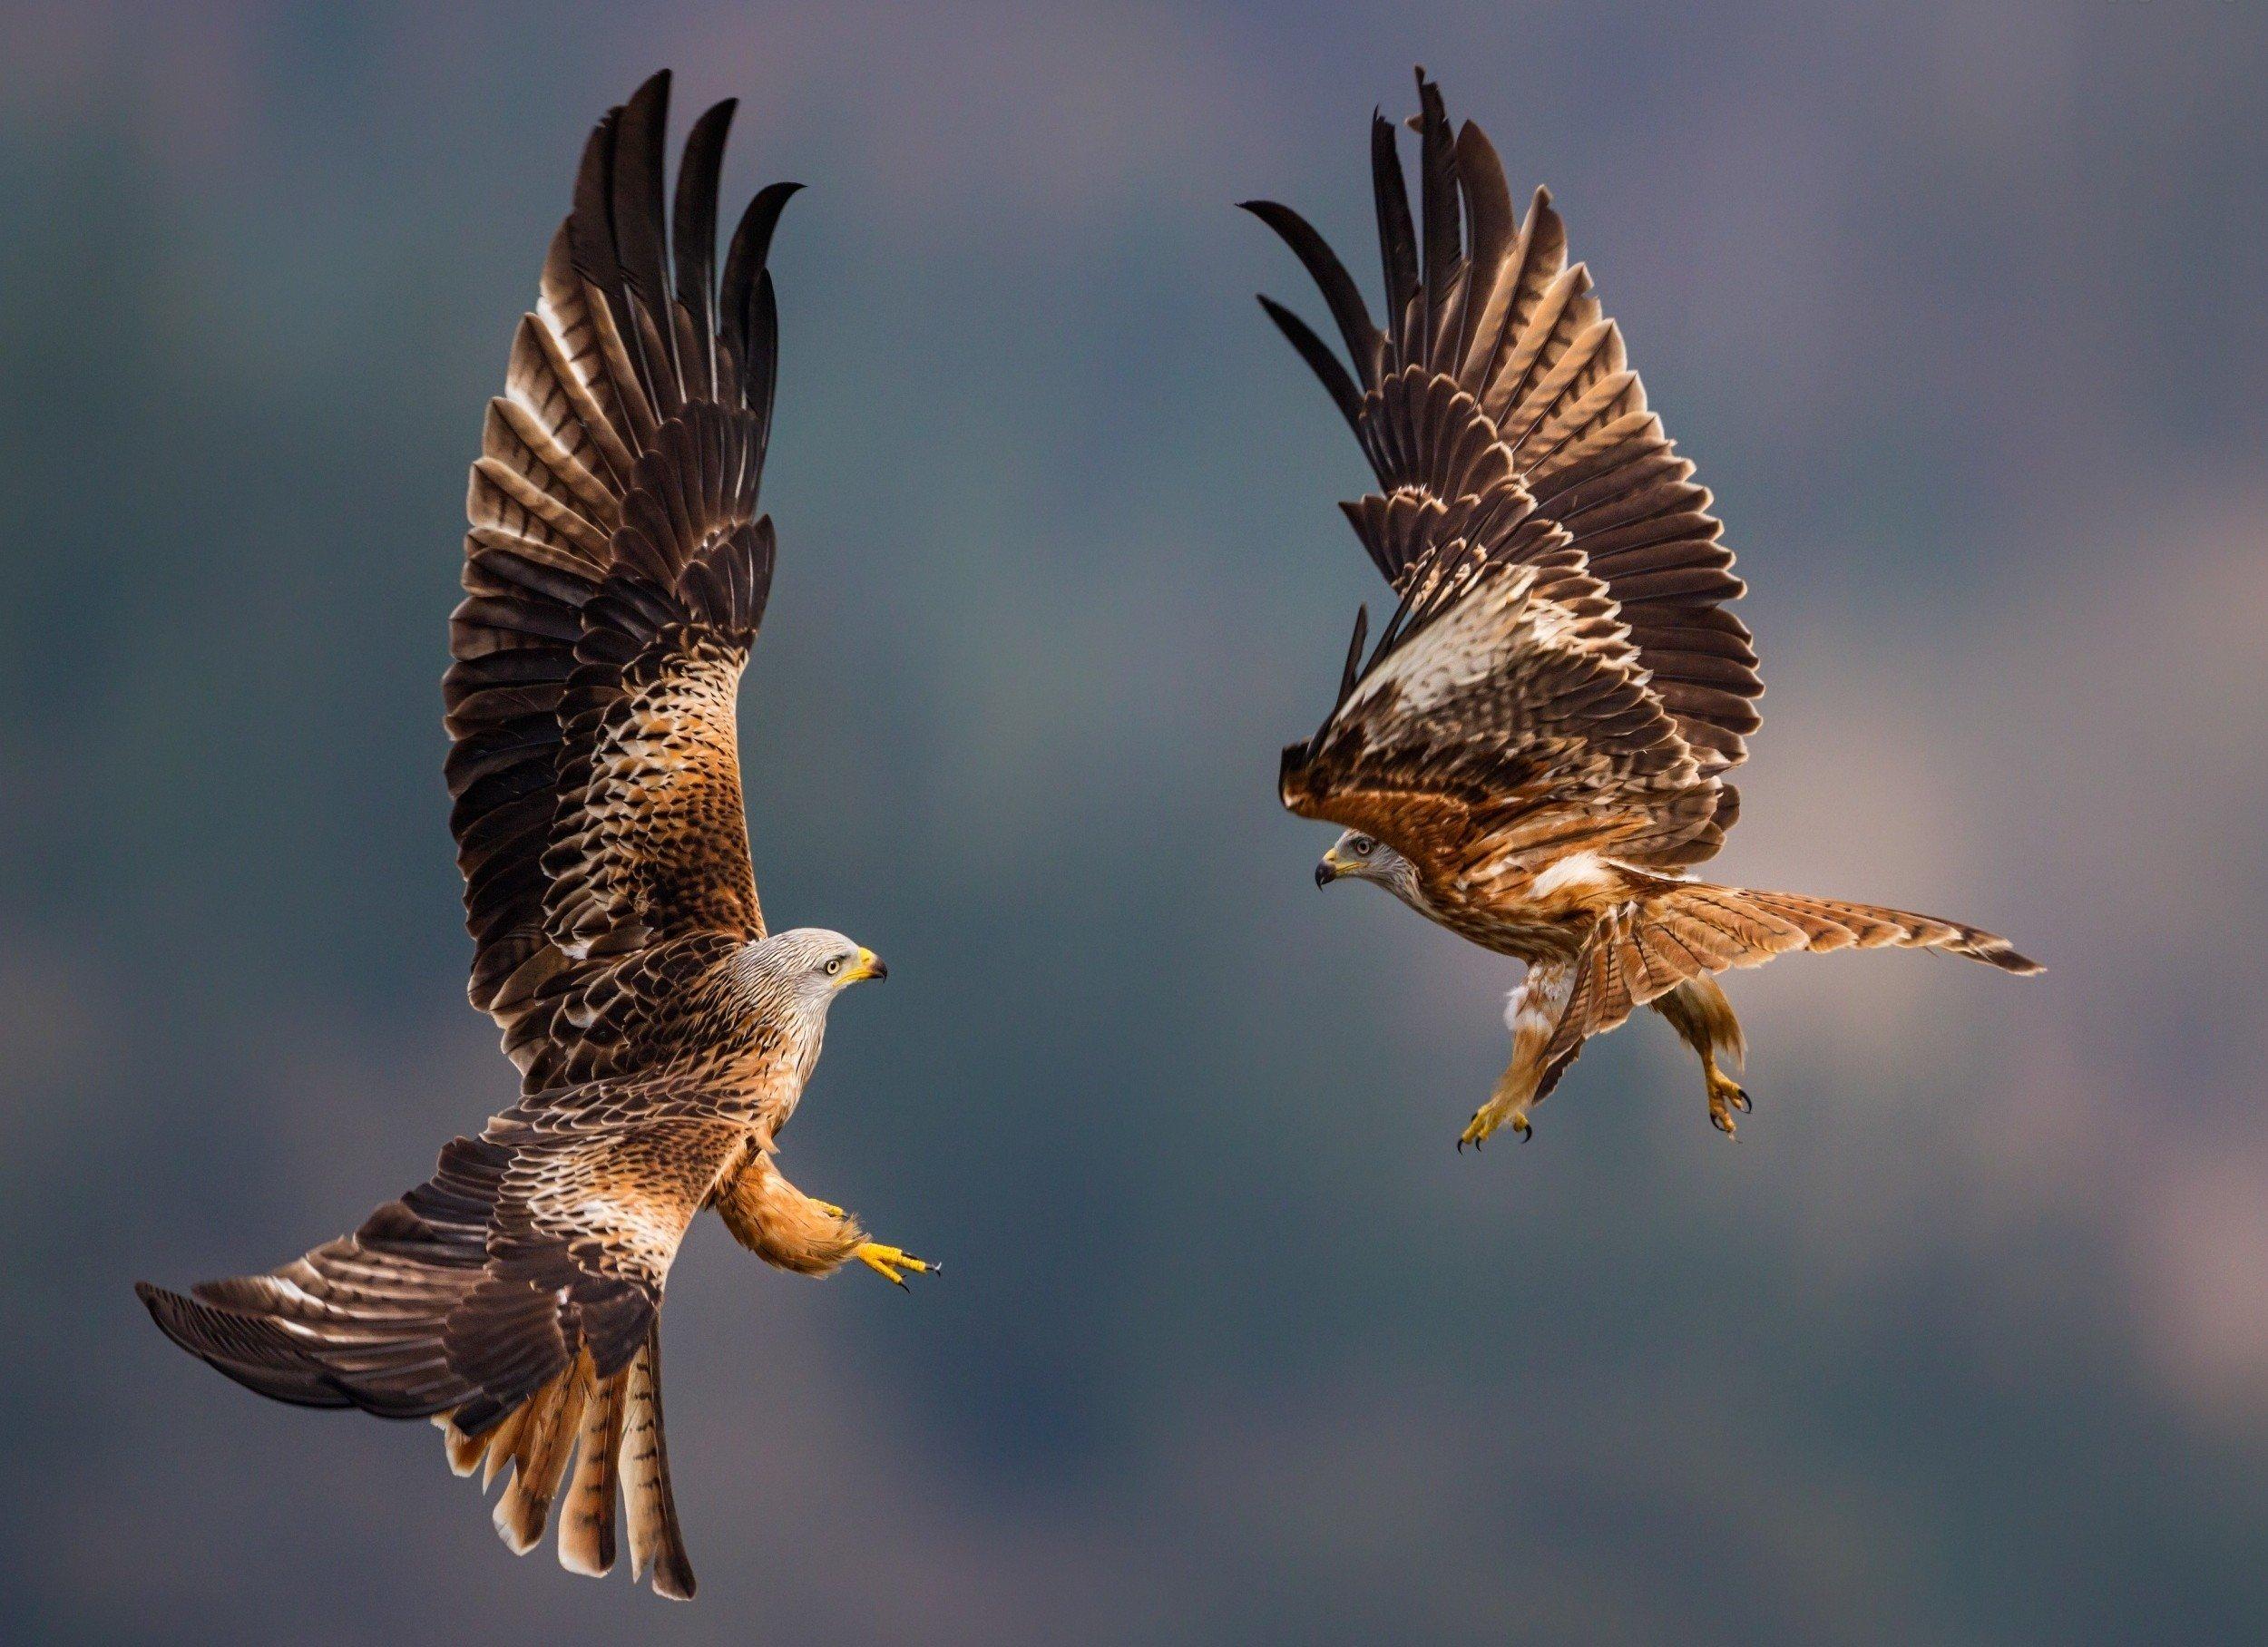 Nature animal bird national geographic water reflection - National geographic wild wallpapers ...